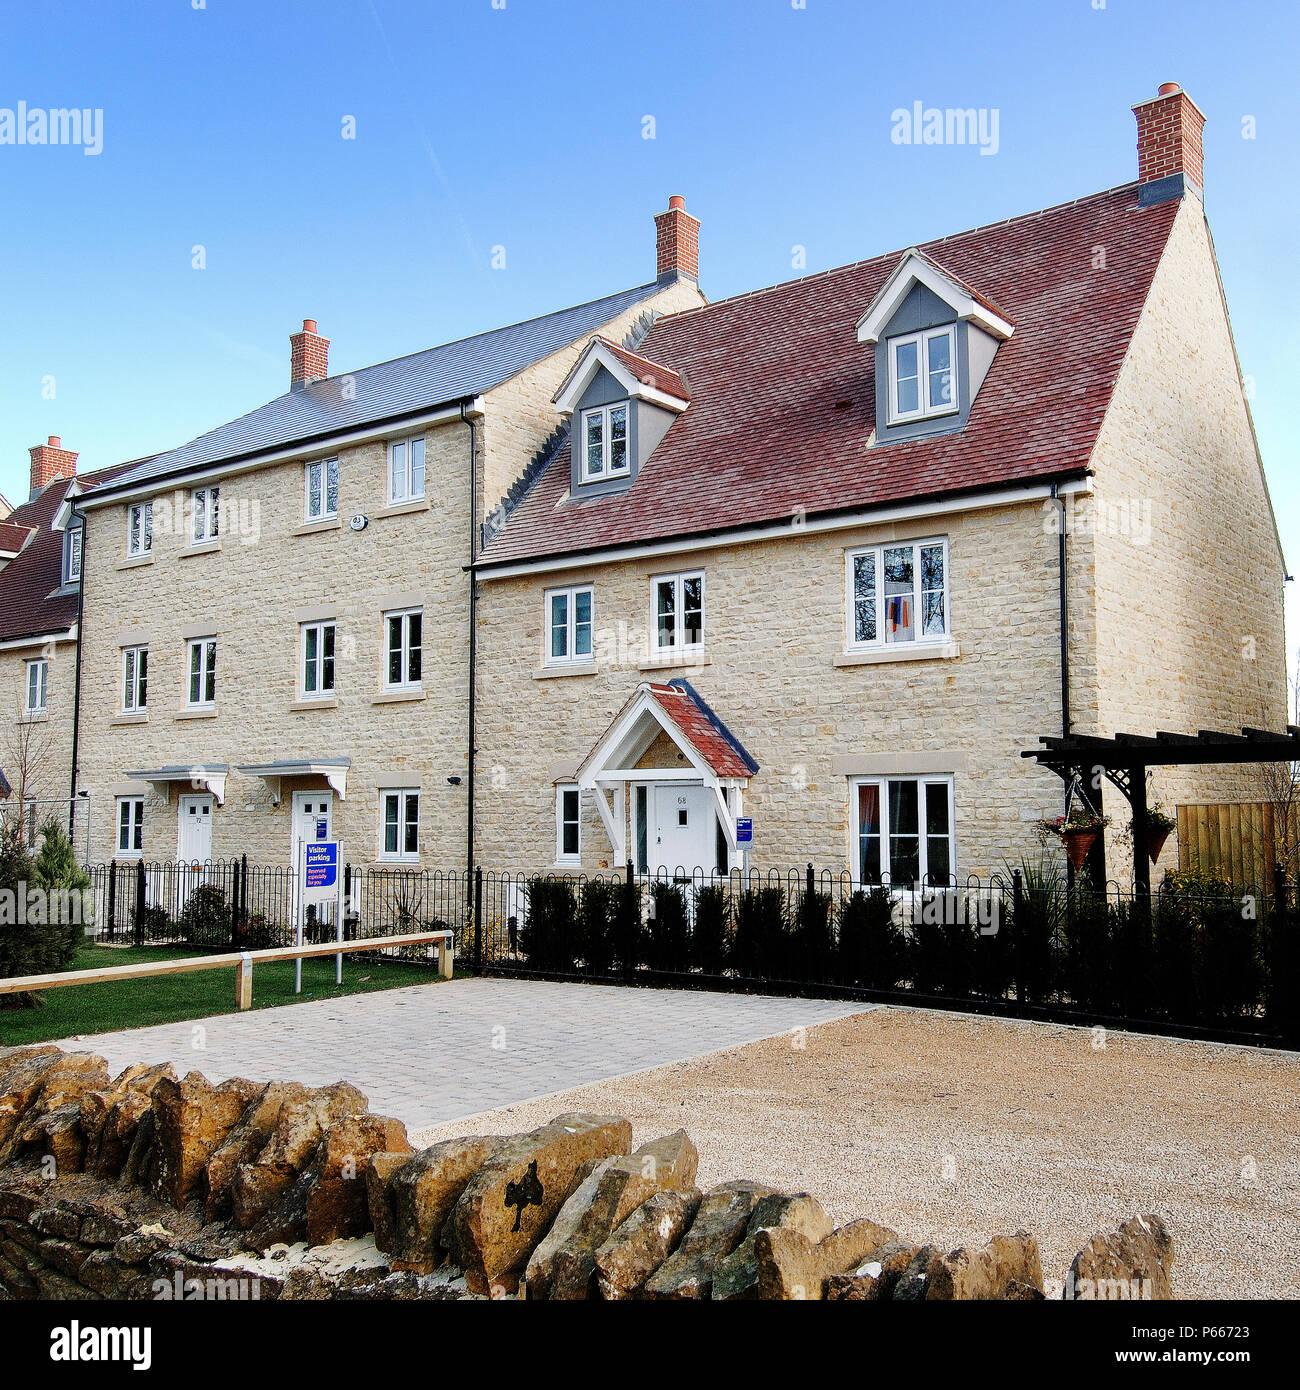 Luxury Modern Build House, UK